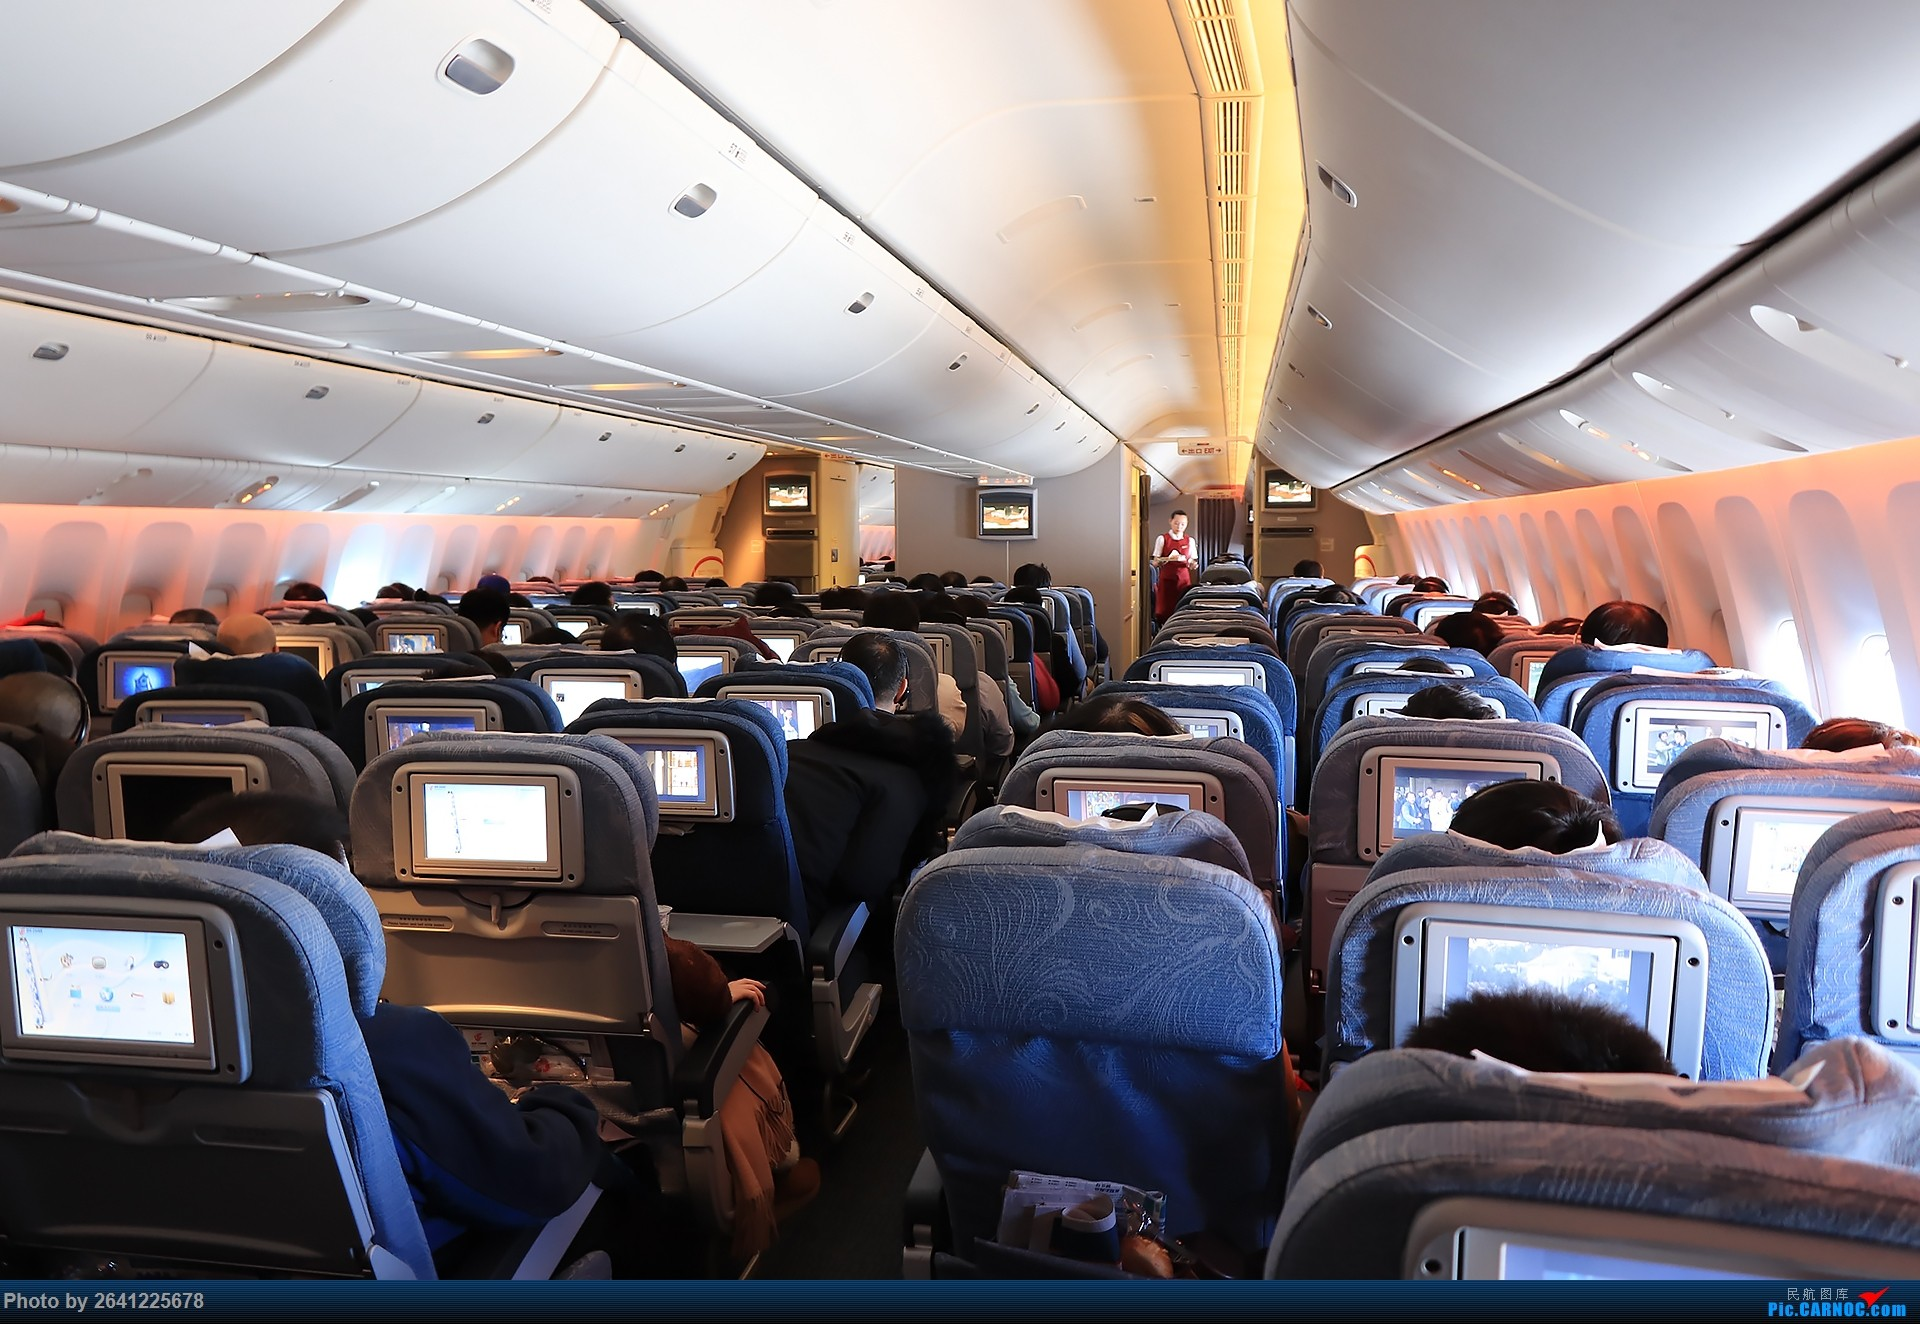 Re:[原创]【小周游记第6集】淳朴滇东南 | 虽赶上降温,但人心却是暖暖的。(首次体验国航77w,东航737max8,昆明拍机另发) BOEING 777-300ER B-2047 中国北京首都国际机场